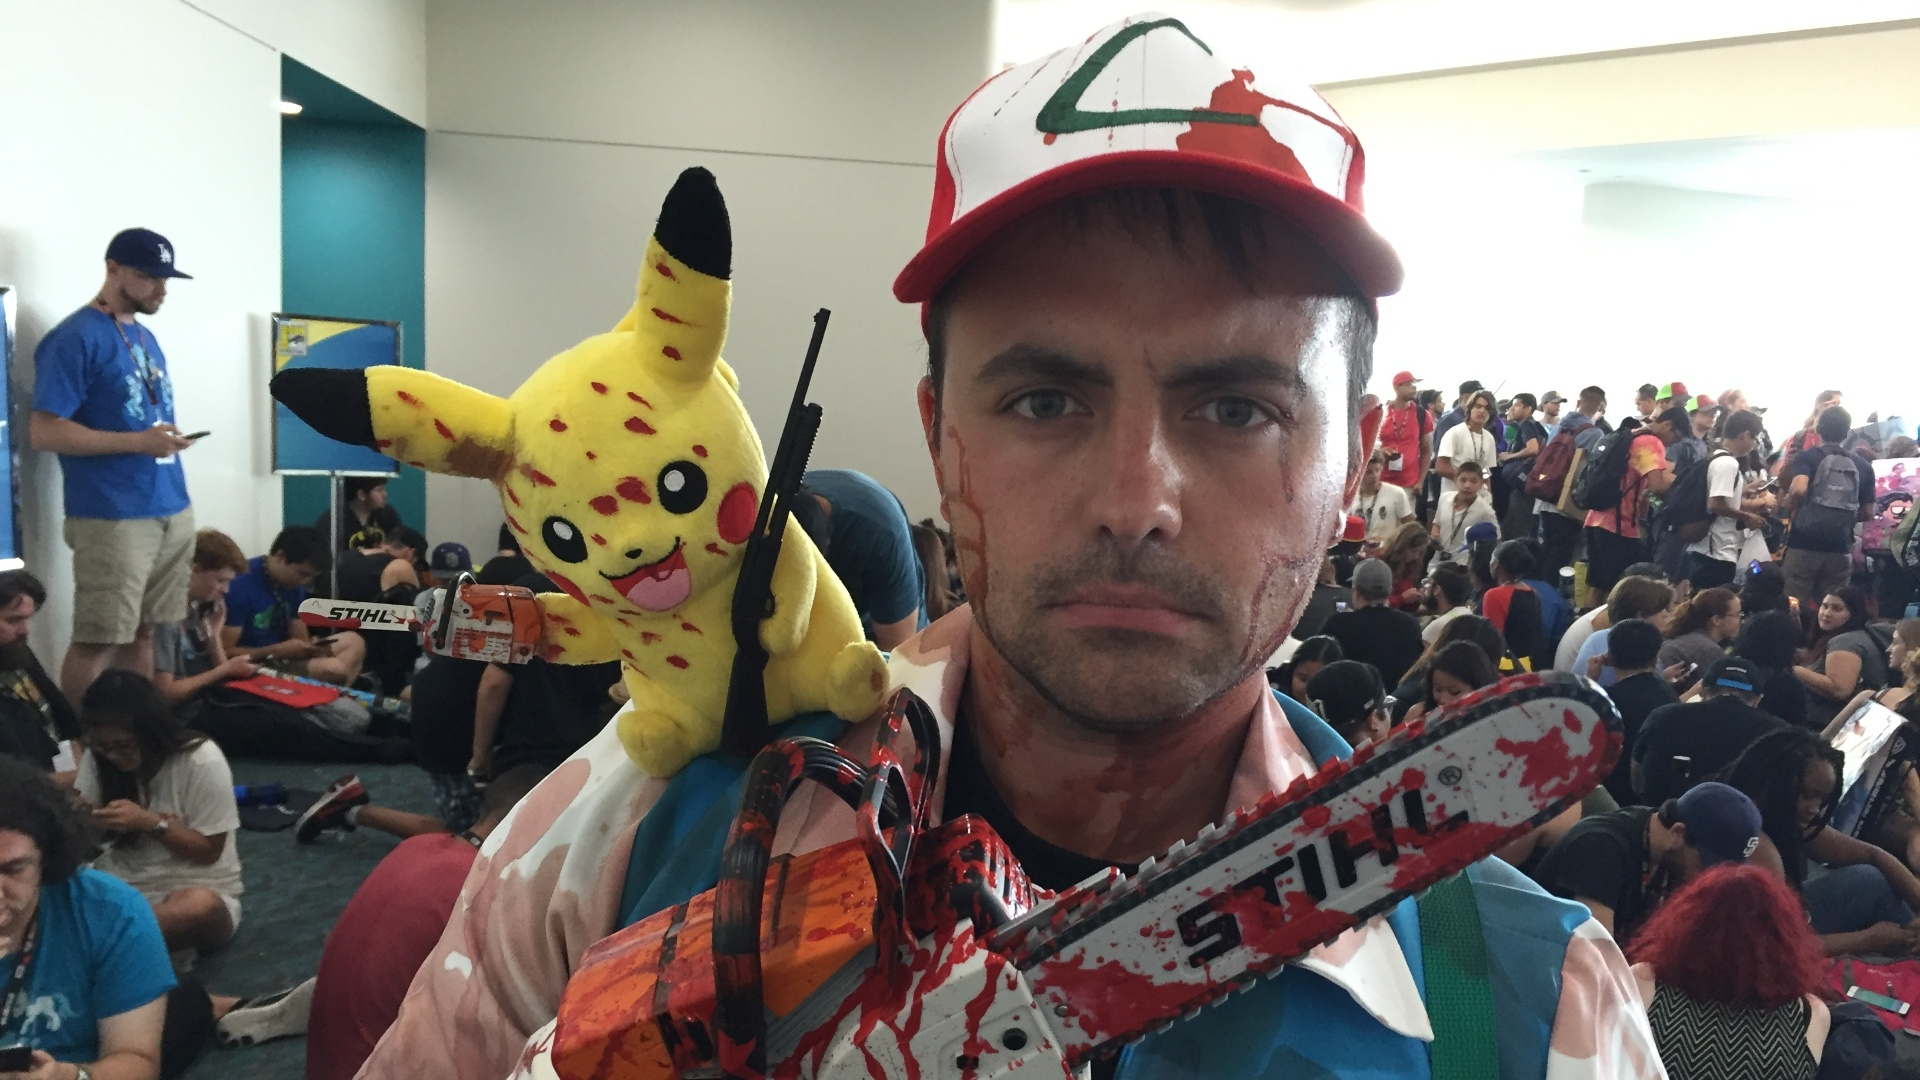 Shaylor Duraleau, 29, vestido como o personagem Ash, de Pokémon, durante a San Diego Comic-Con